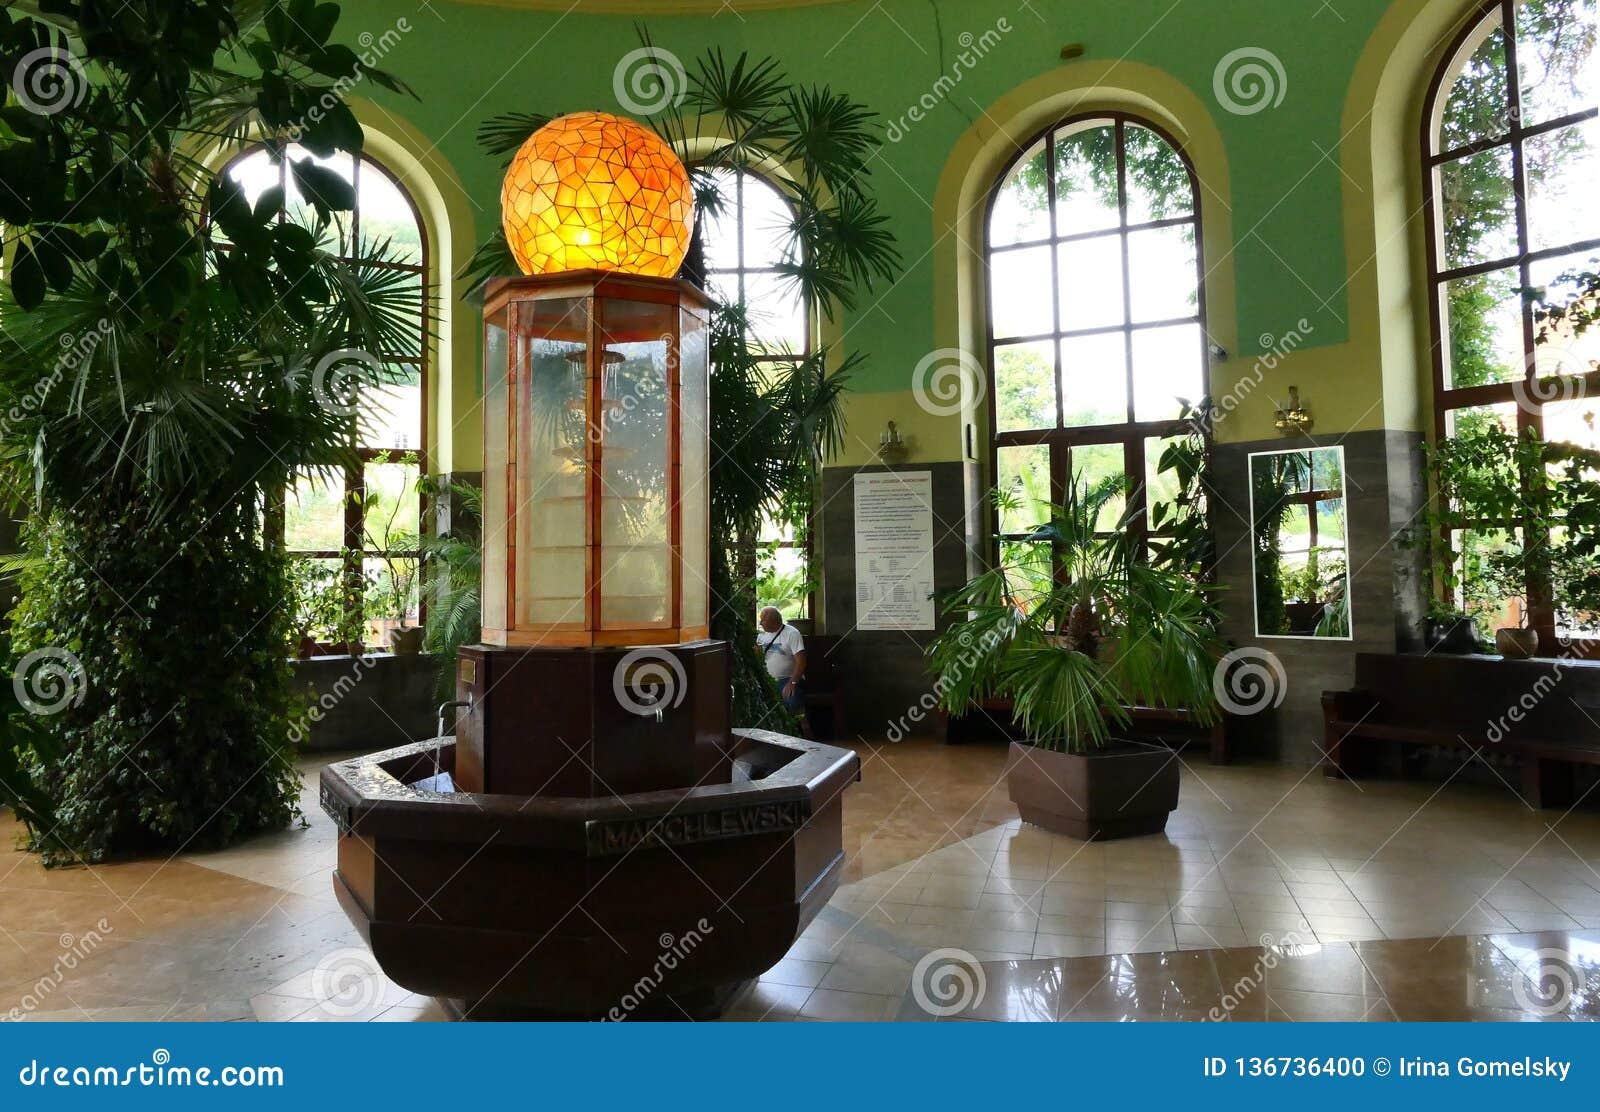 Polen, Kudowa Zdroj - 17. Juni 2018: Der Innenraum des Pavillons der Mineralwässer